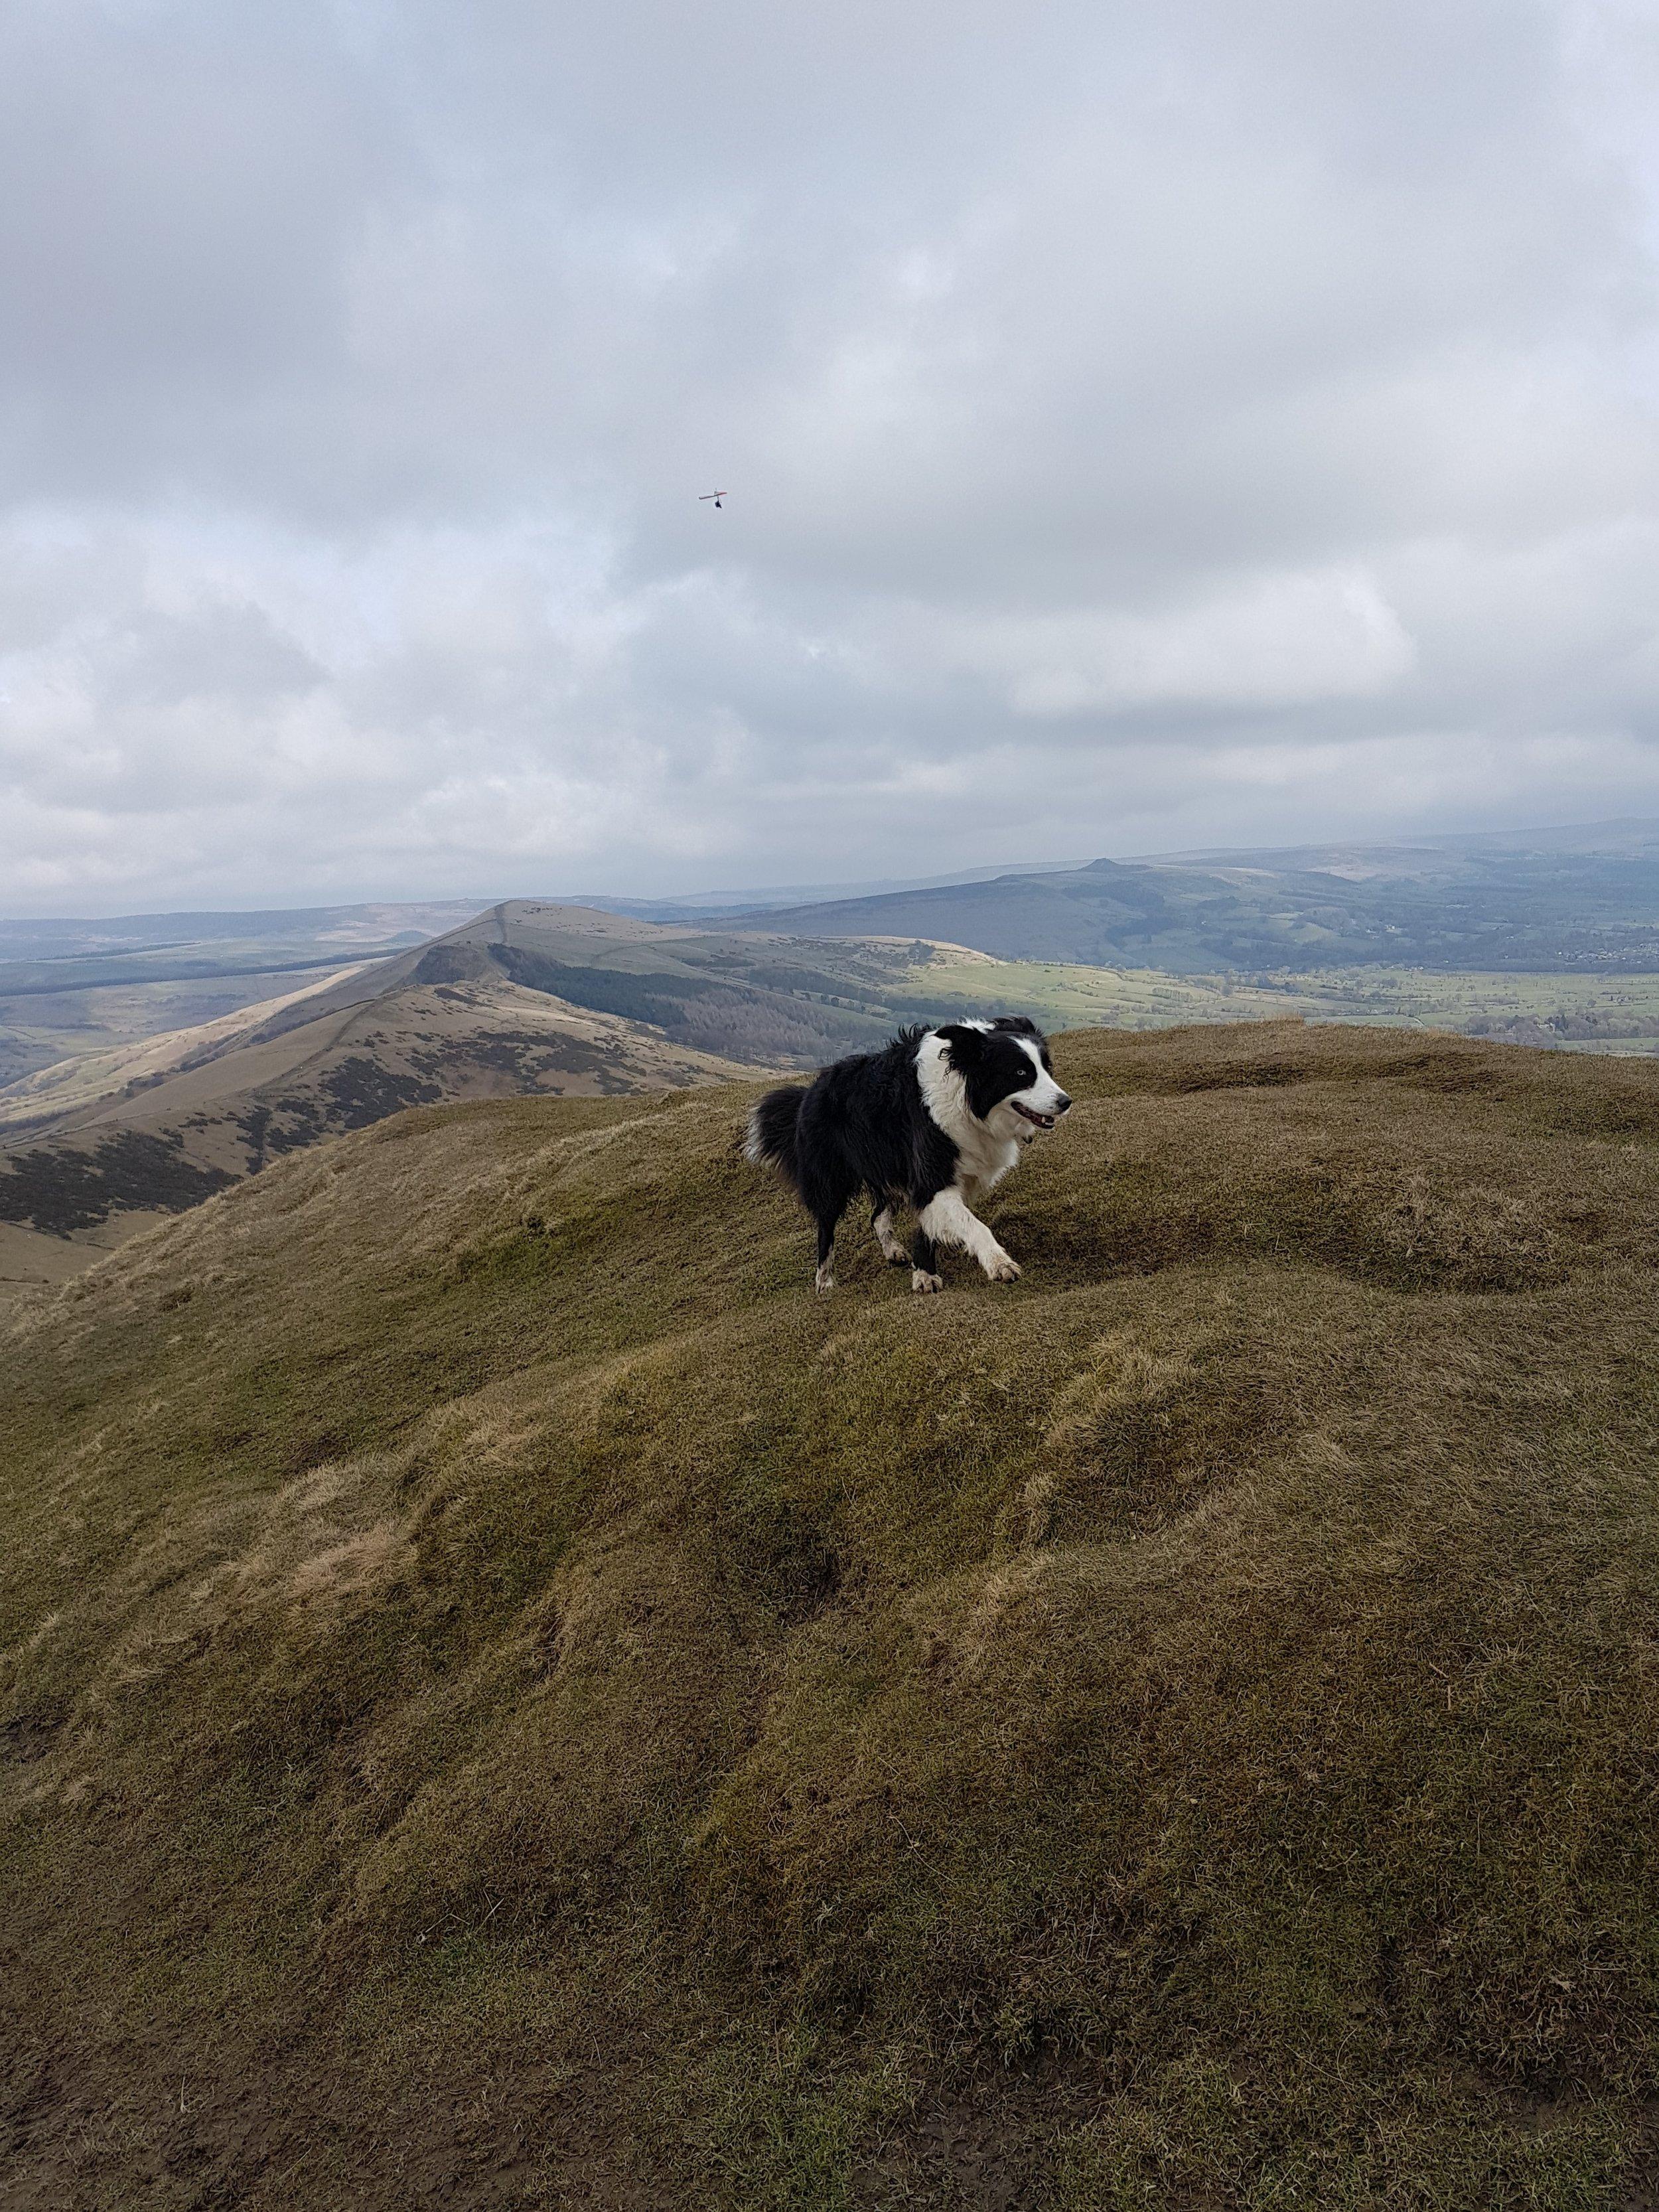 The ridge at the summit of Mam Tor